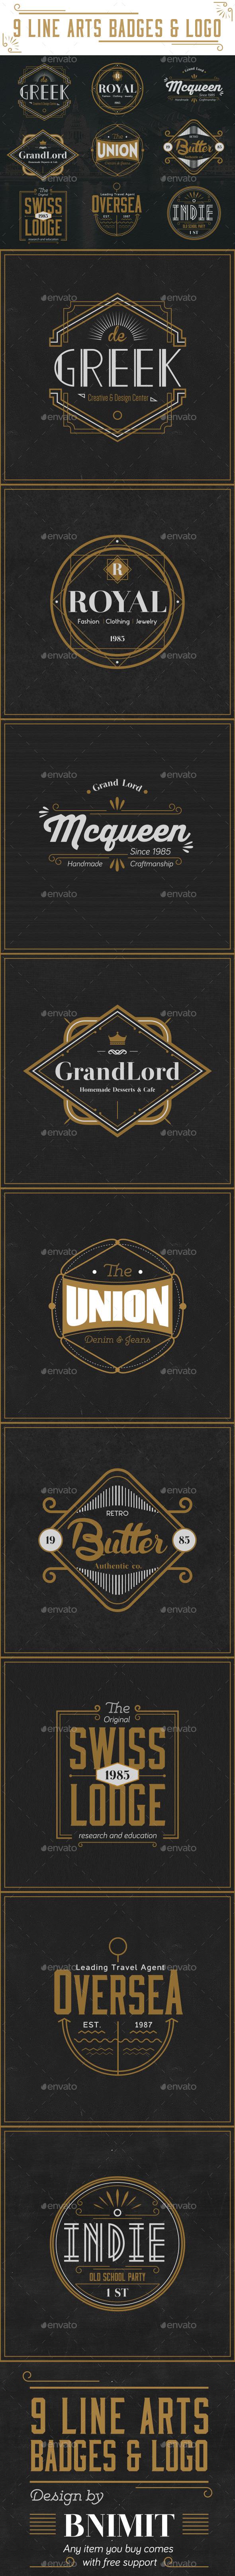 9 Line Arts Badges & Logo - Badges & Stickers Web Elements